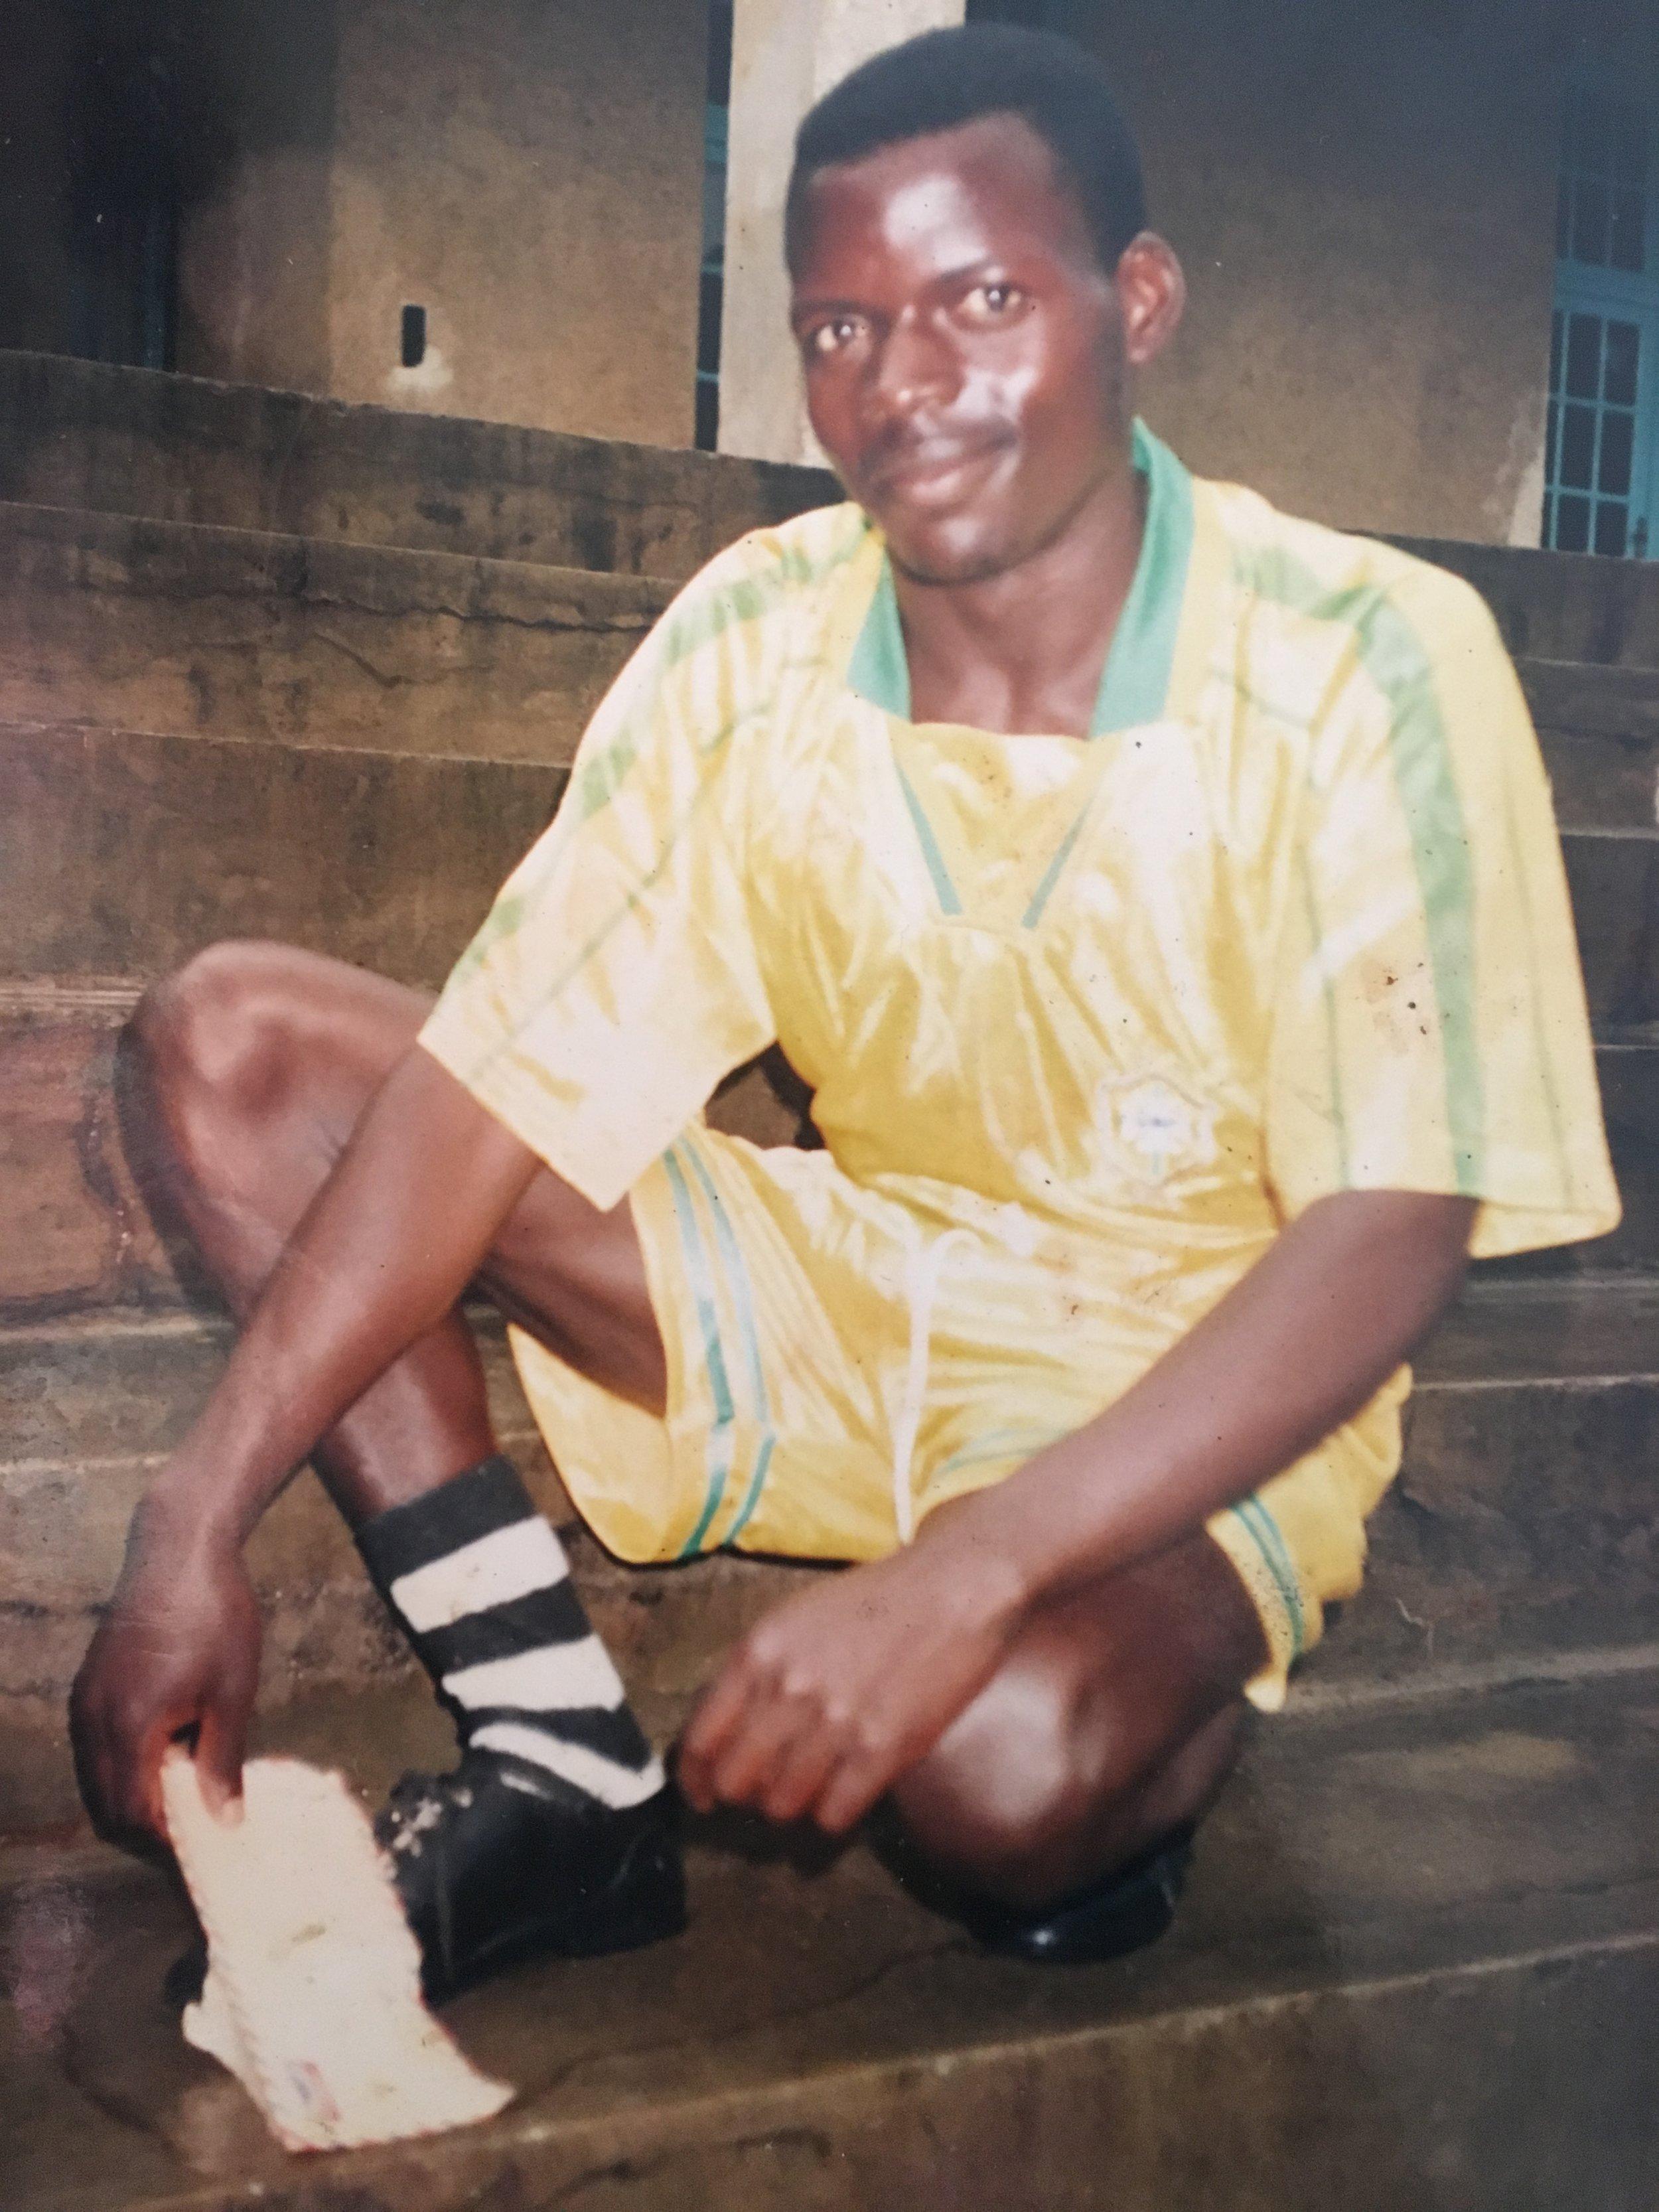 Photo of Bolingo taken in the DRC.